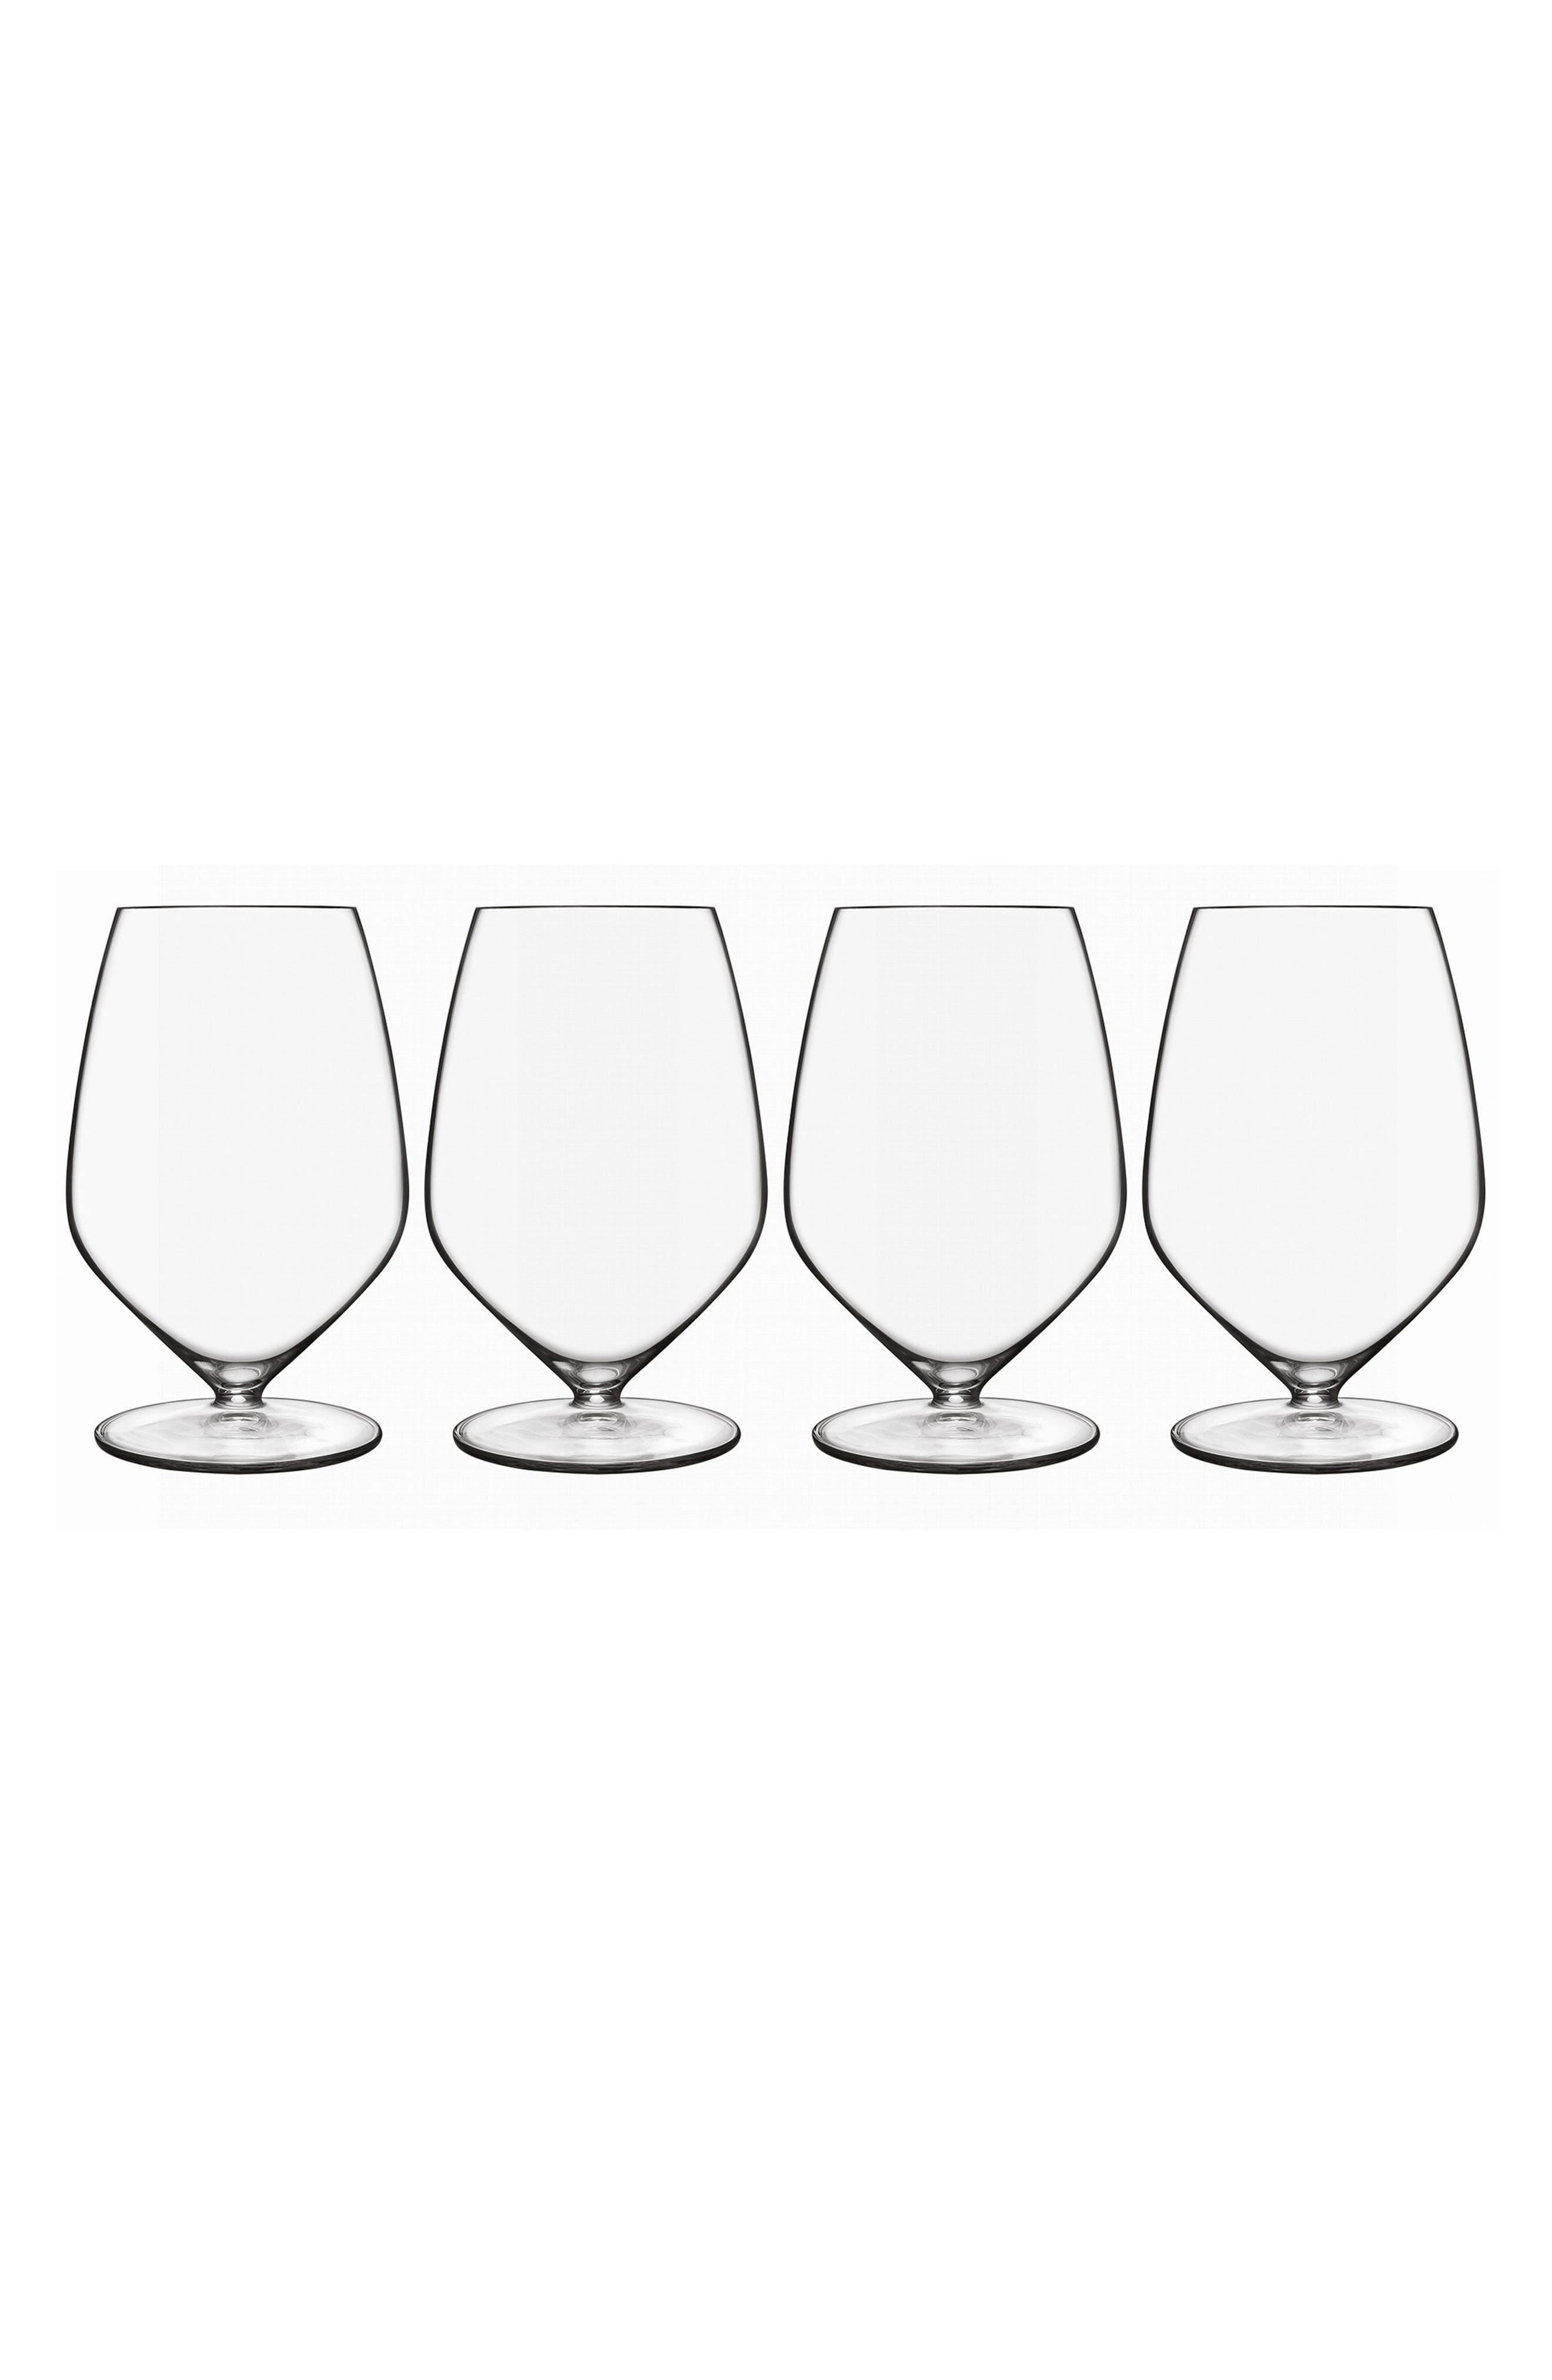 T-Glass Set of 4 Cabernet/Merlot Glasses,                             Main thumbnail 1, color,                             100